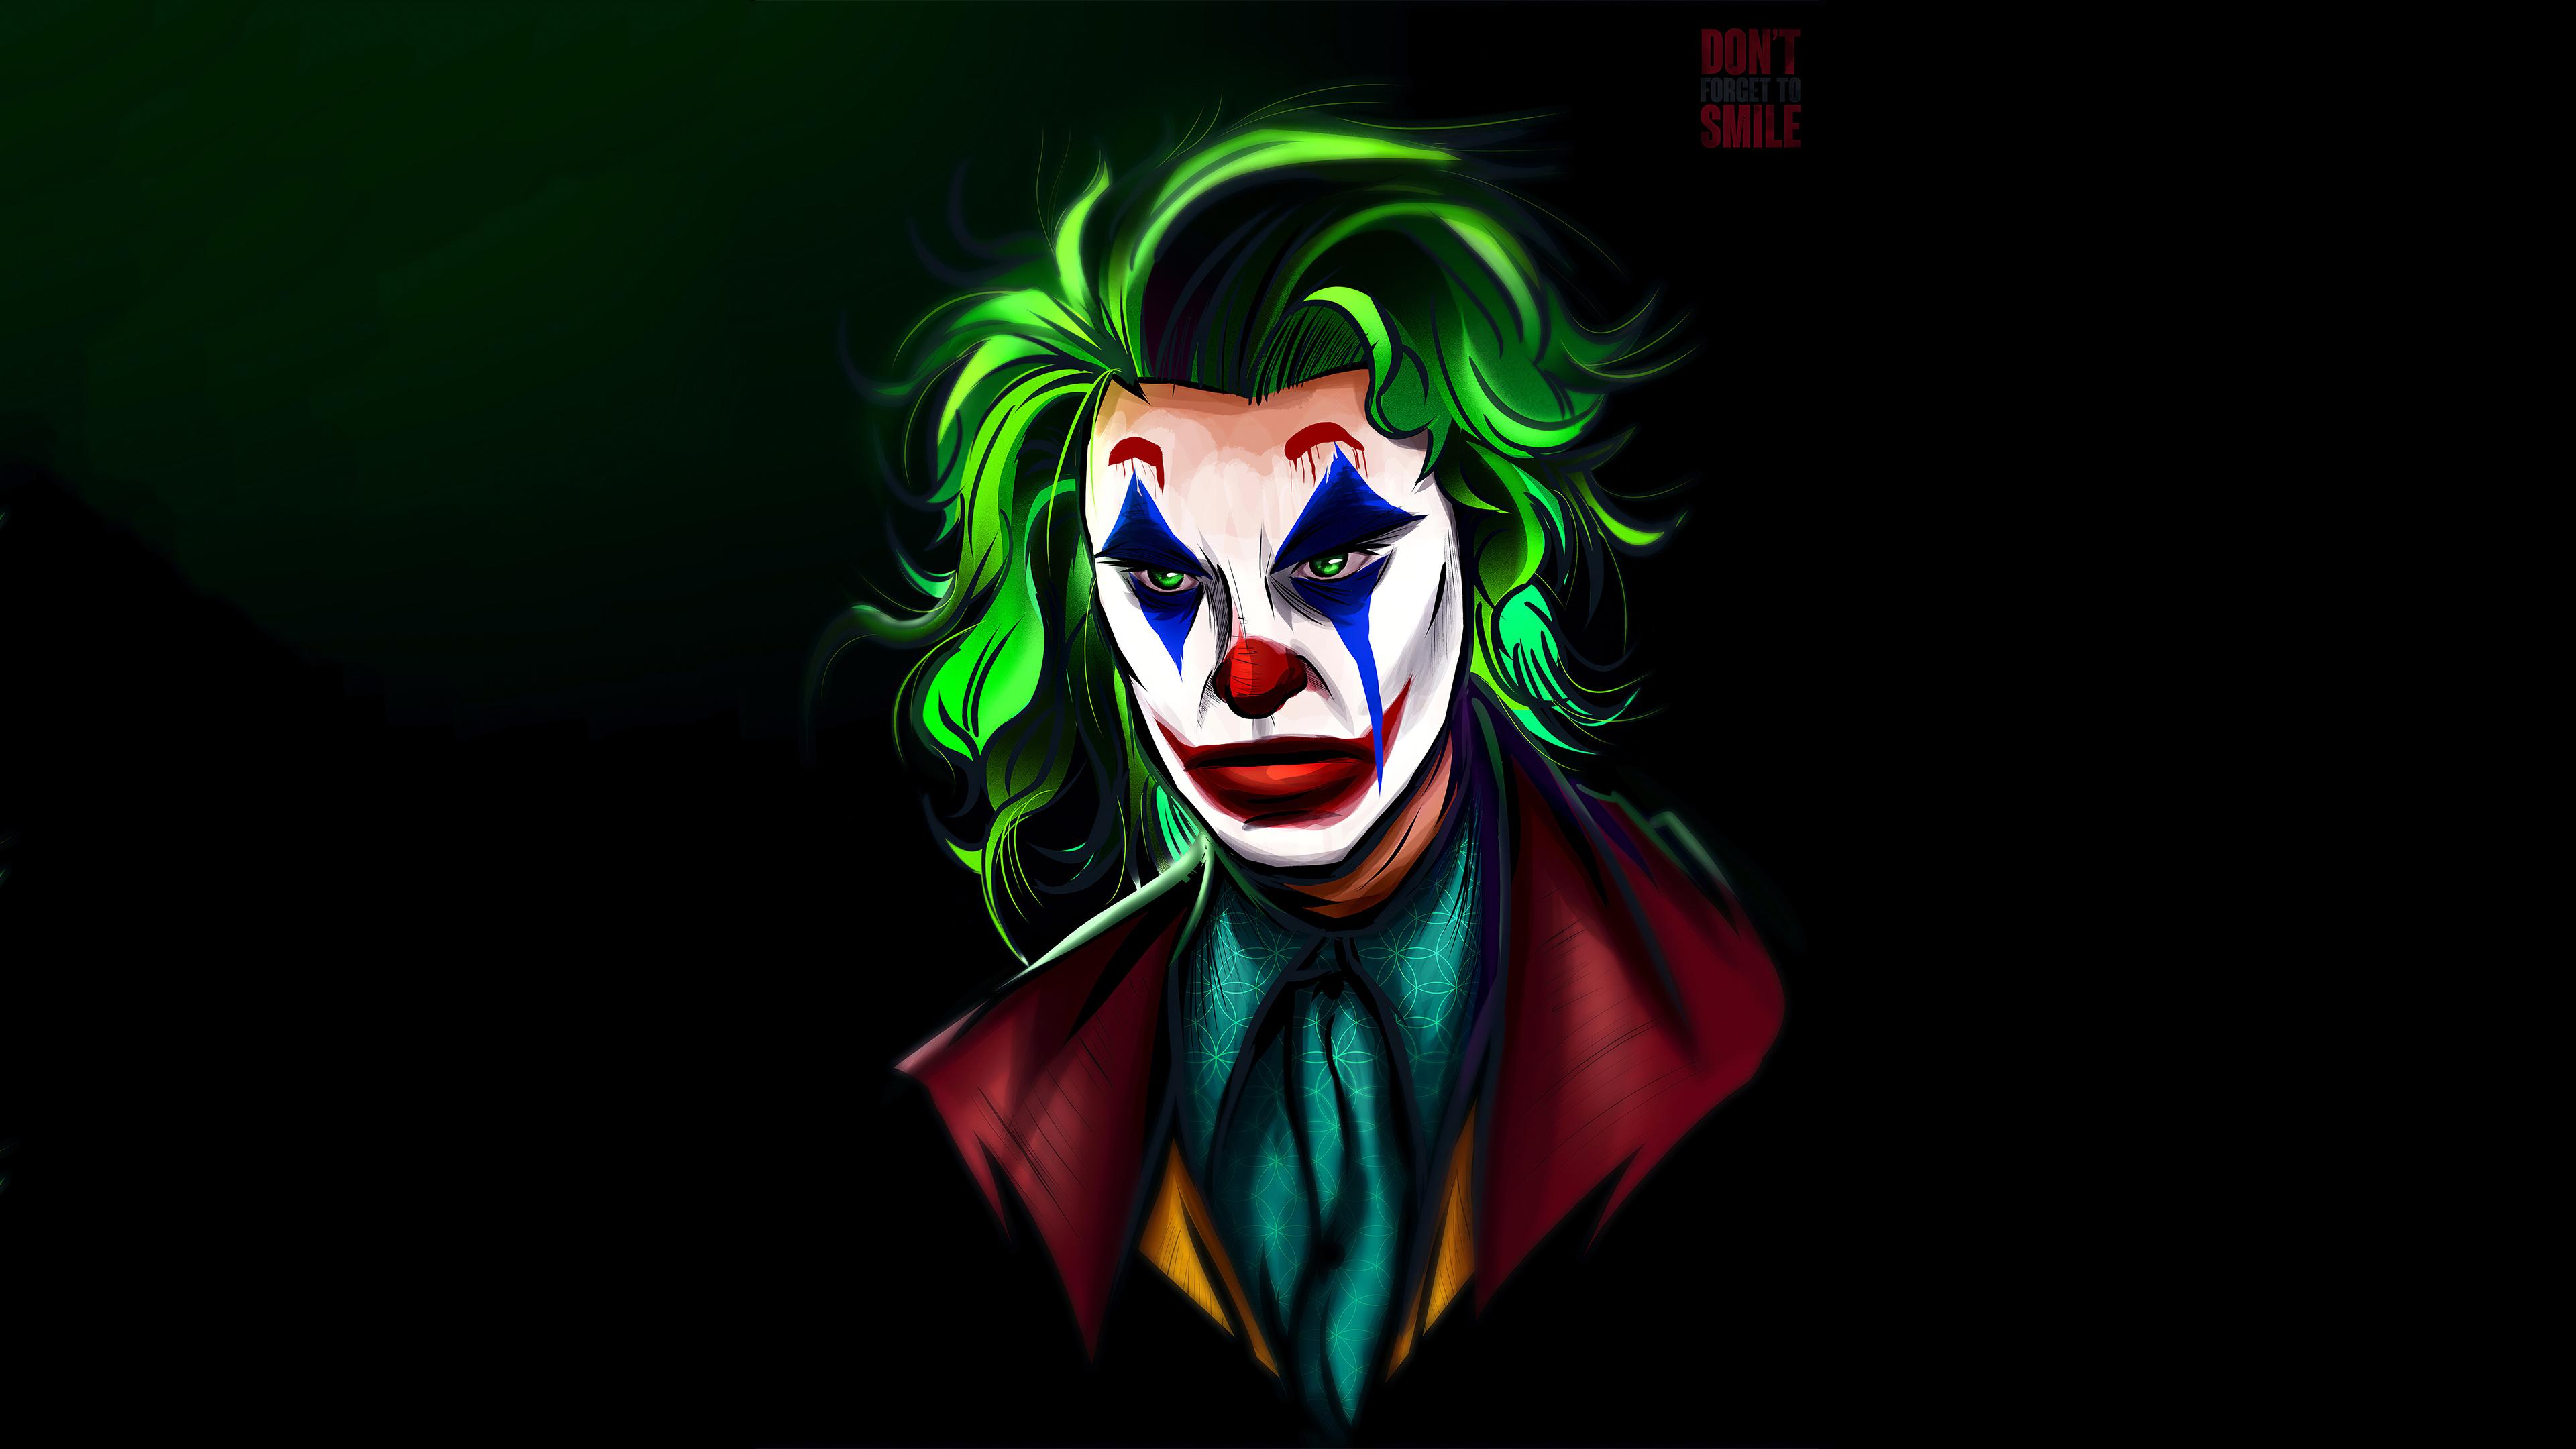 New Joker Fanart Wallpaper Hd Superheroes 4k Wallpapers Images Photos And Background